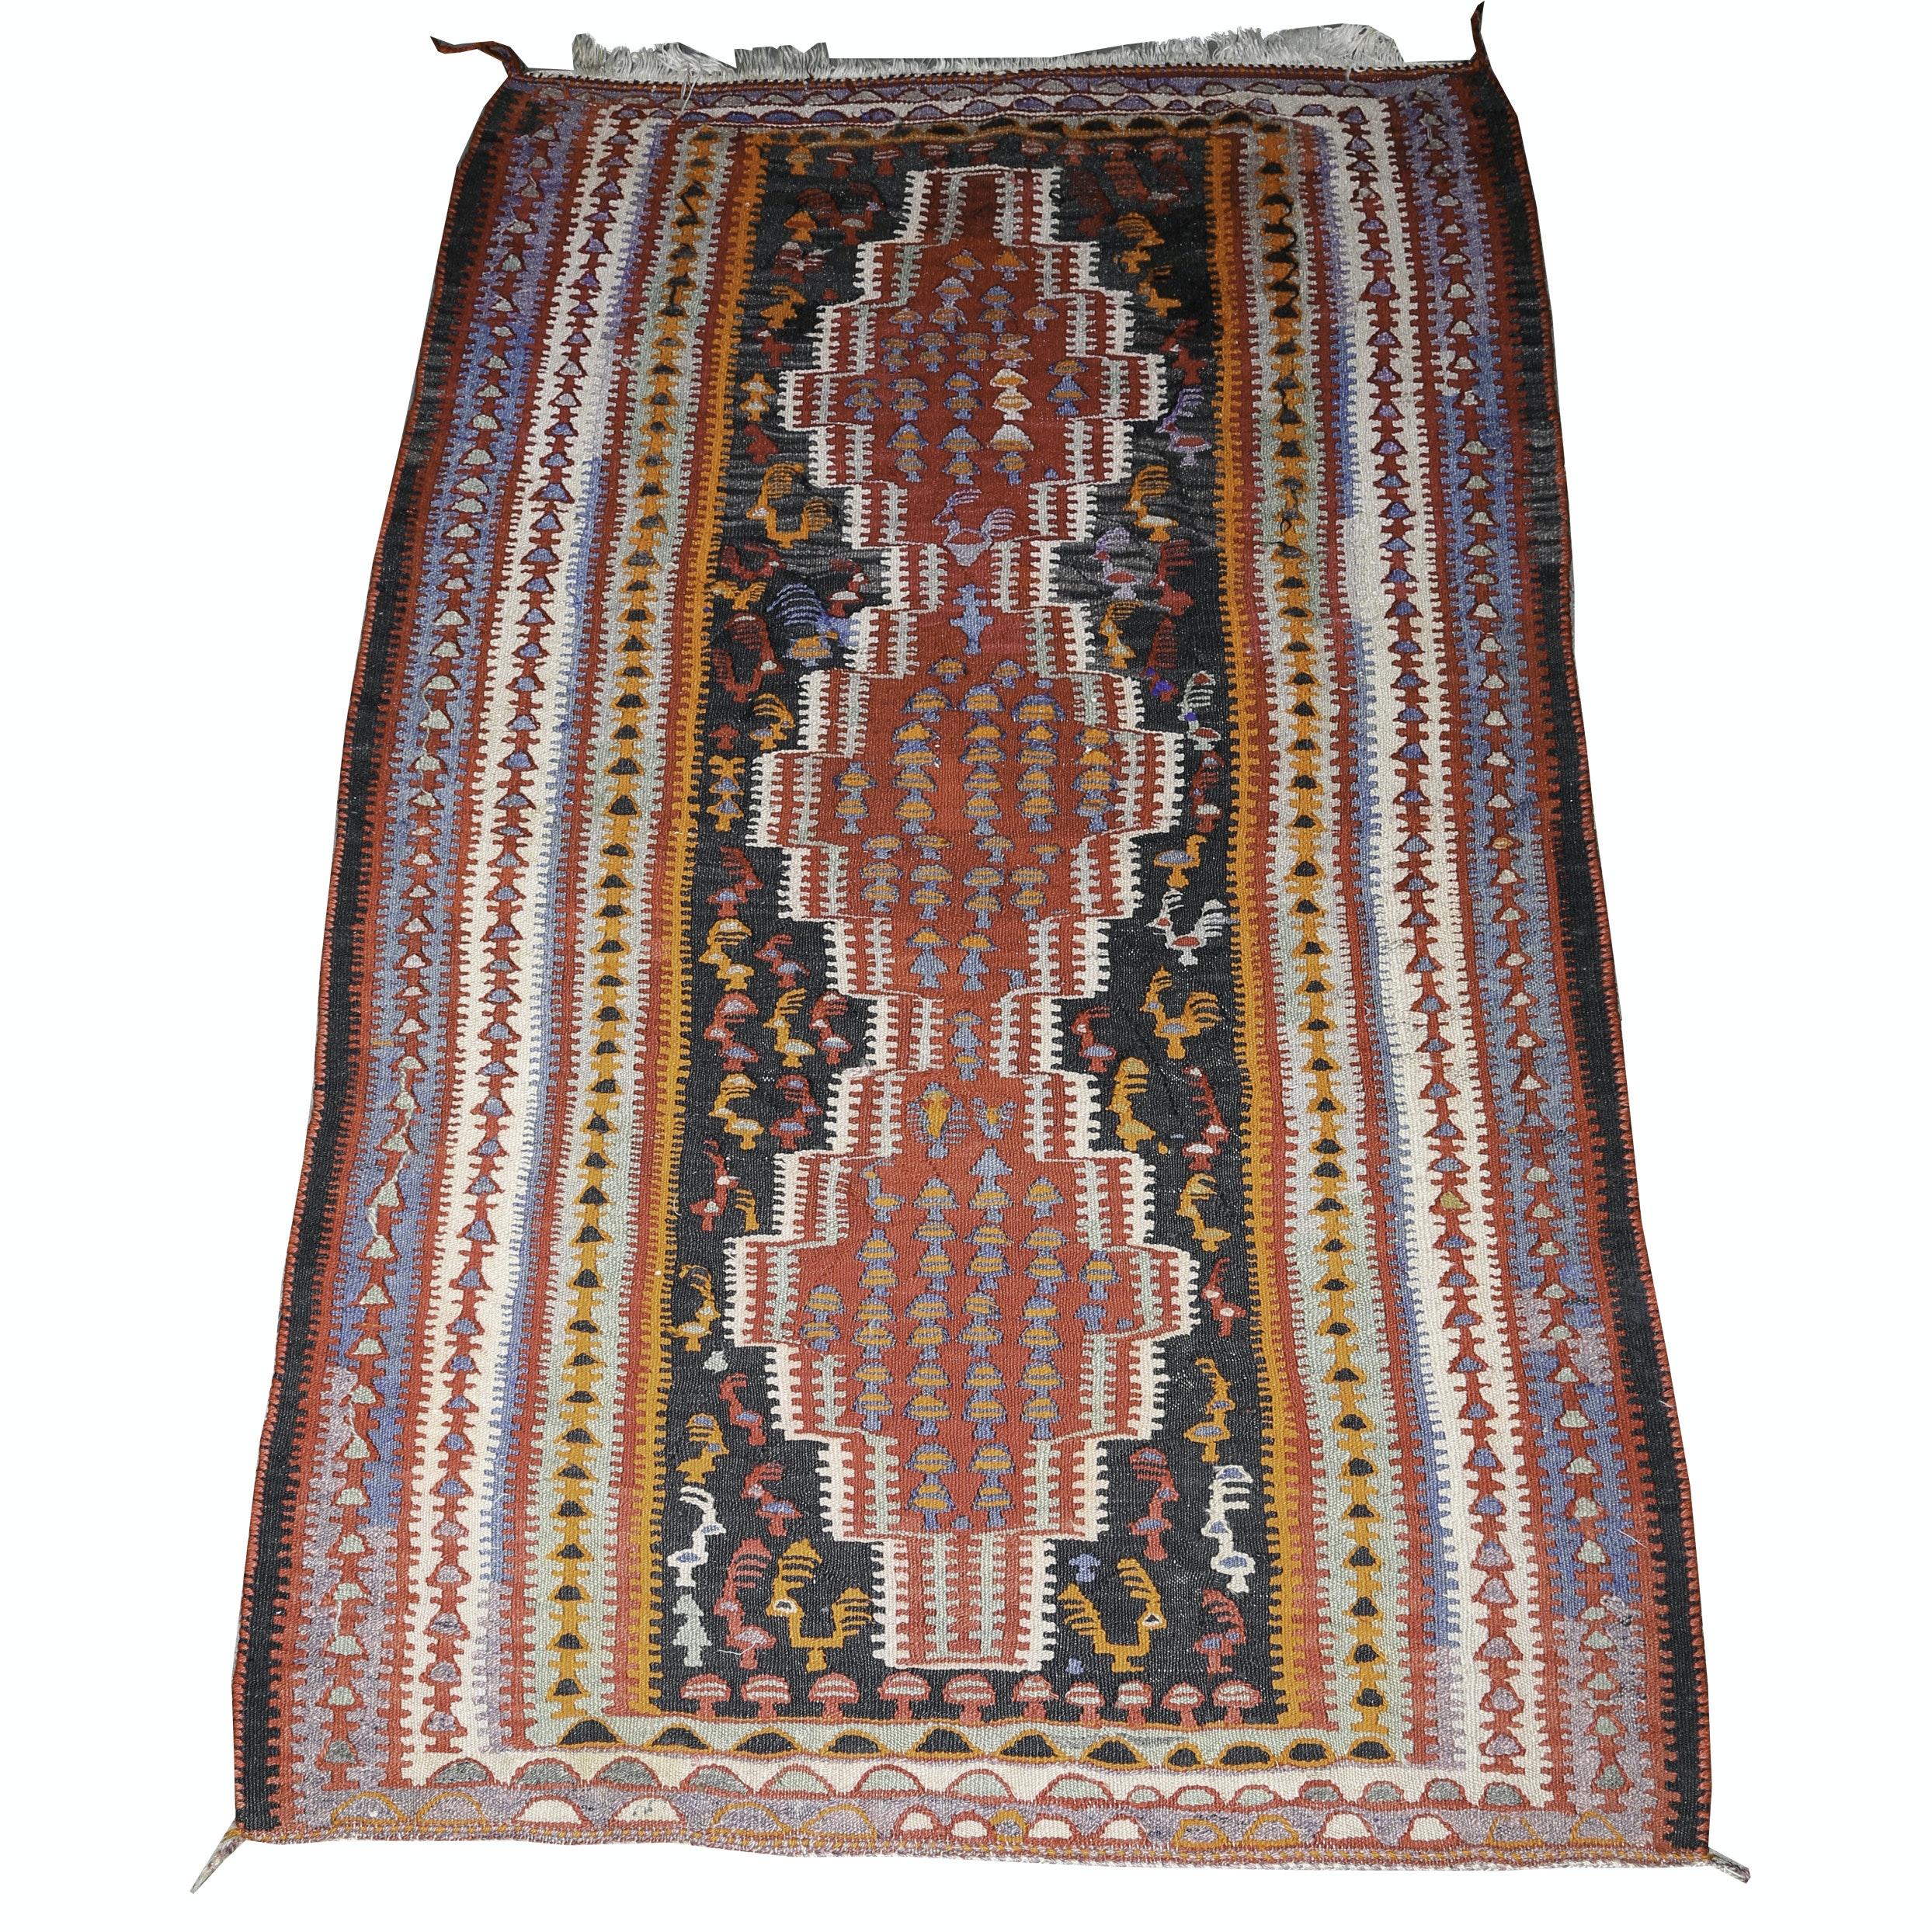 Vintage Handwoven Anatolian Wool Kilim